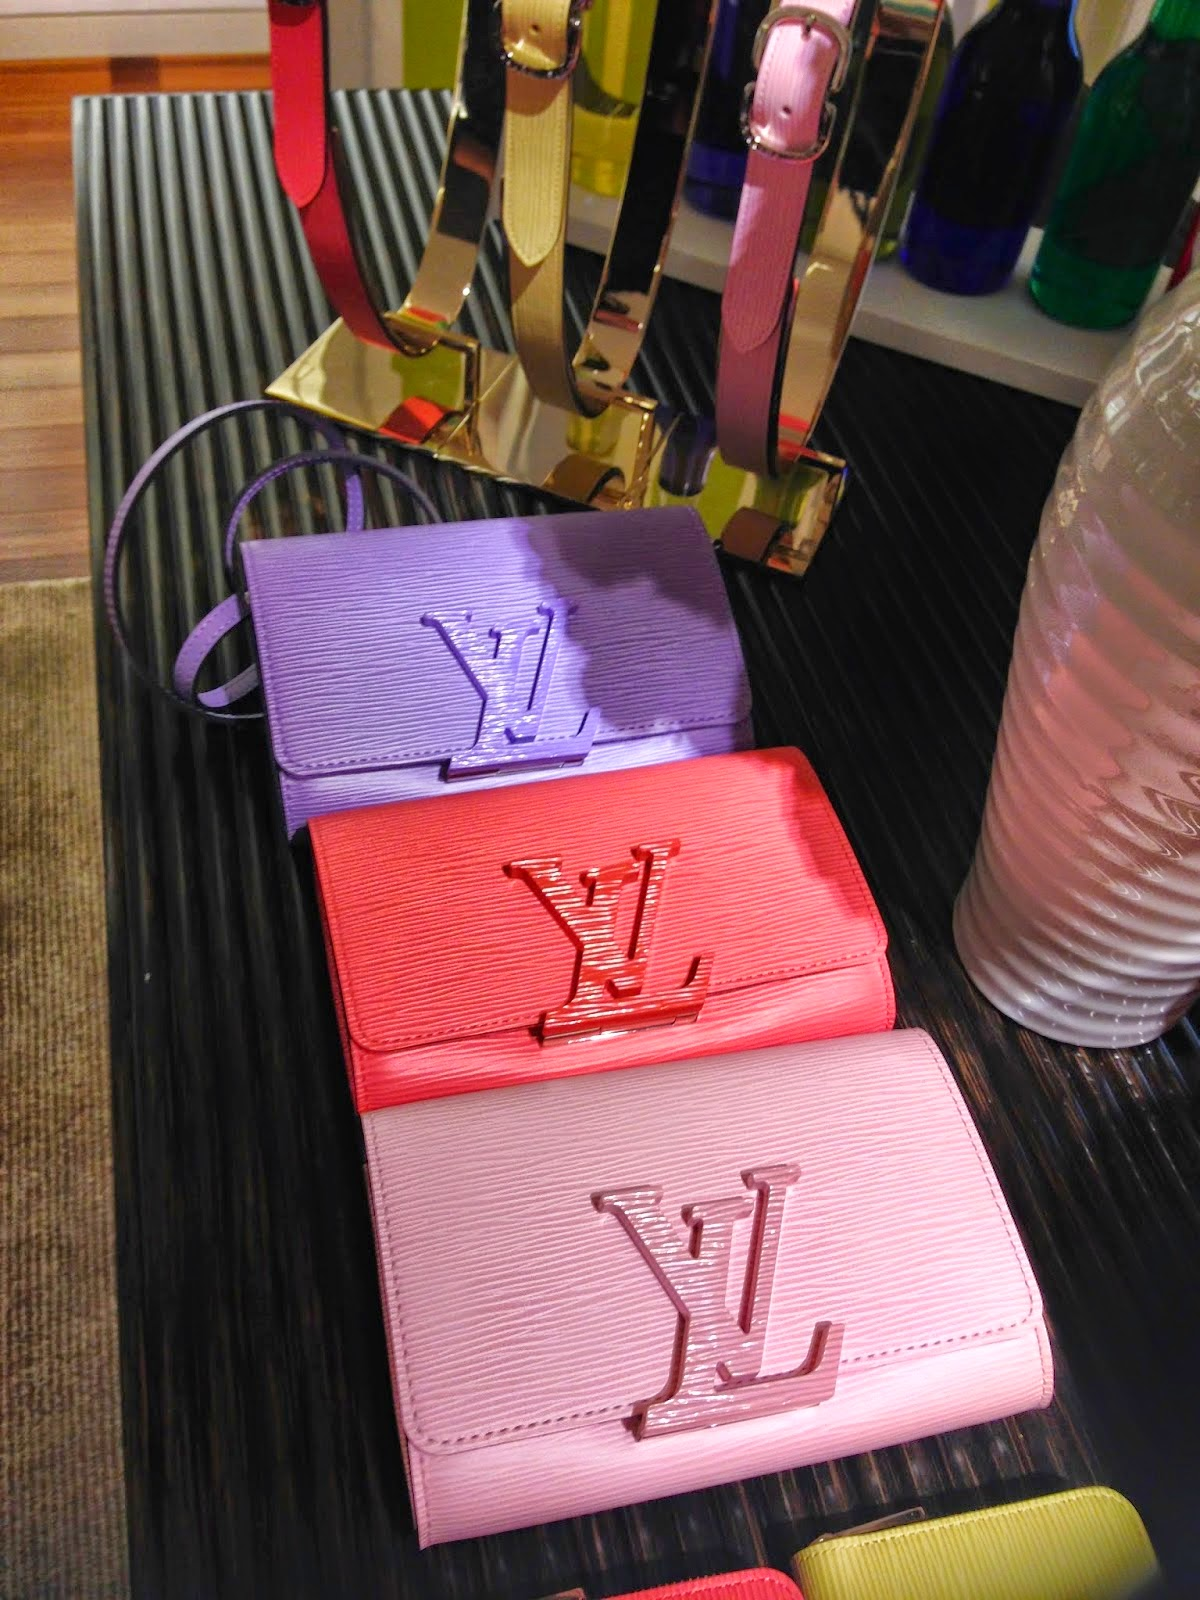 Louis Vuitton's New Pastel Epi Louise Clutches For Summer